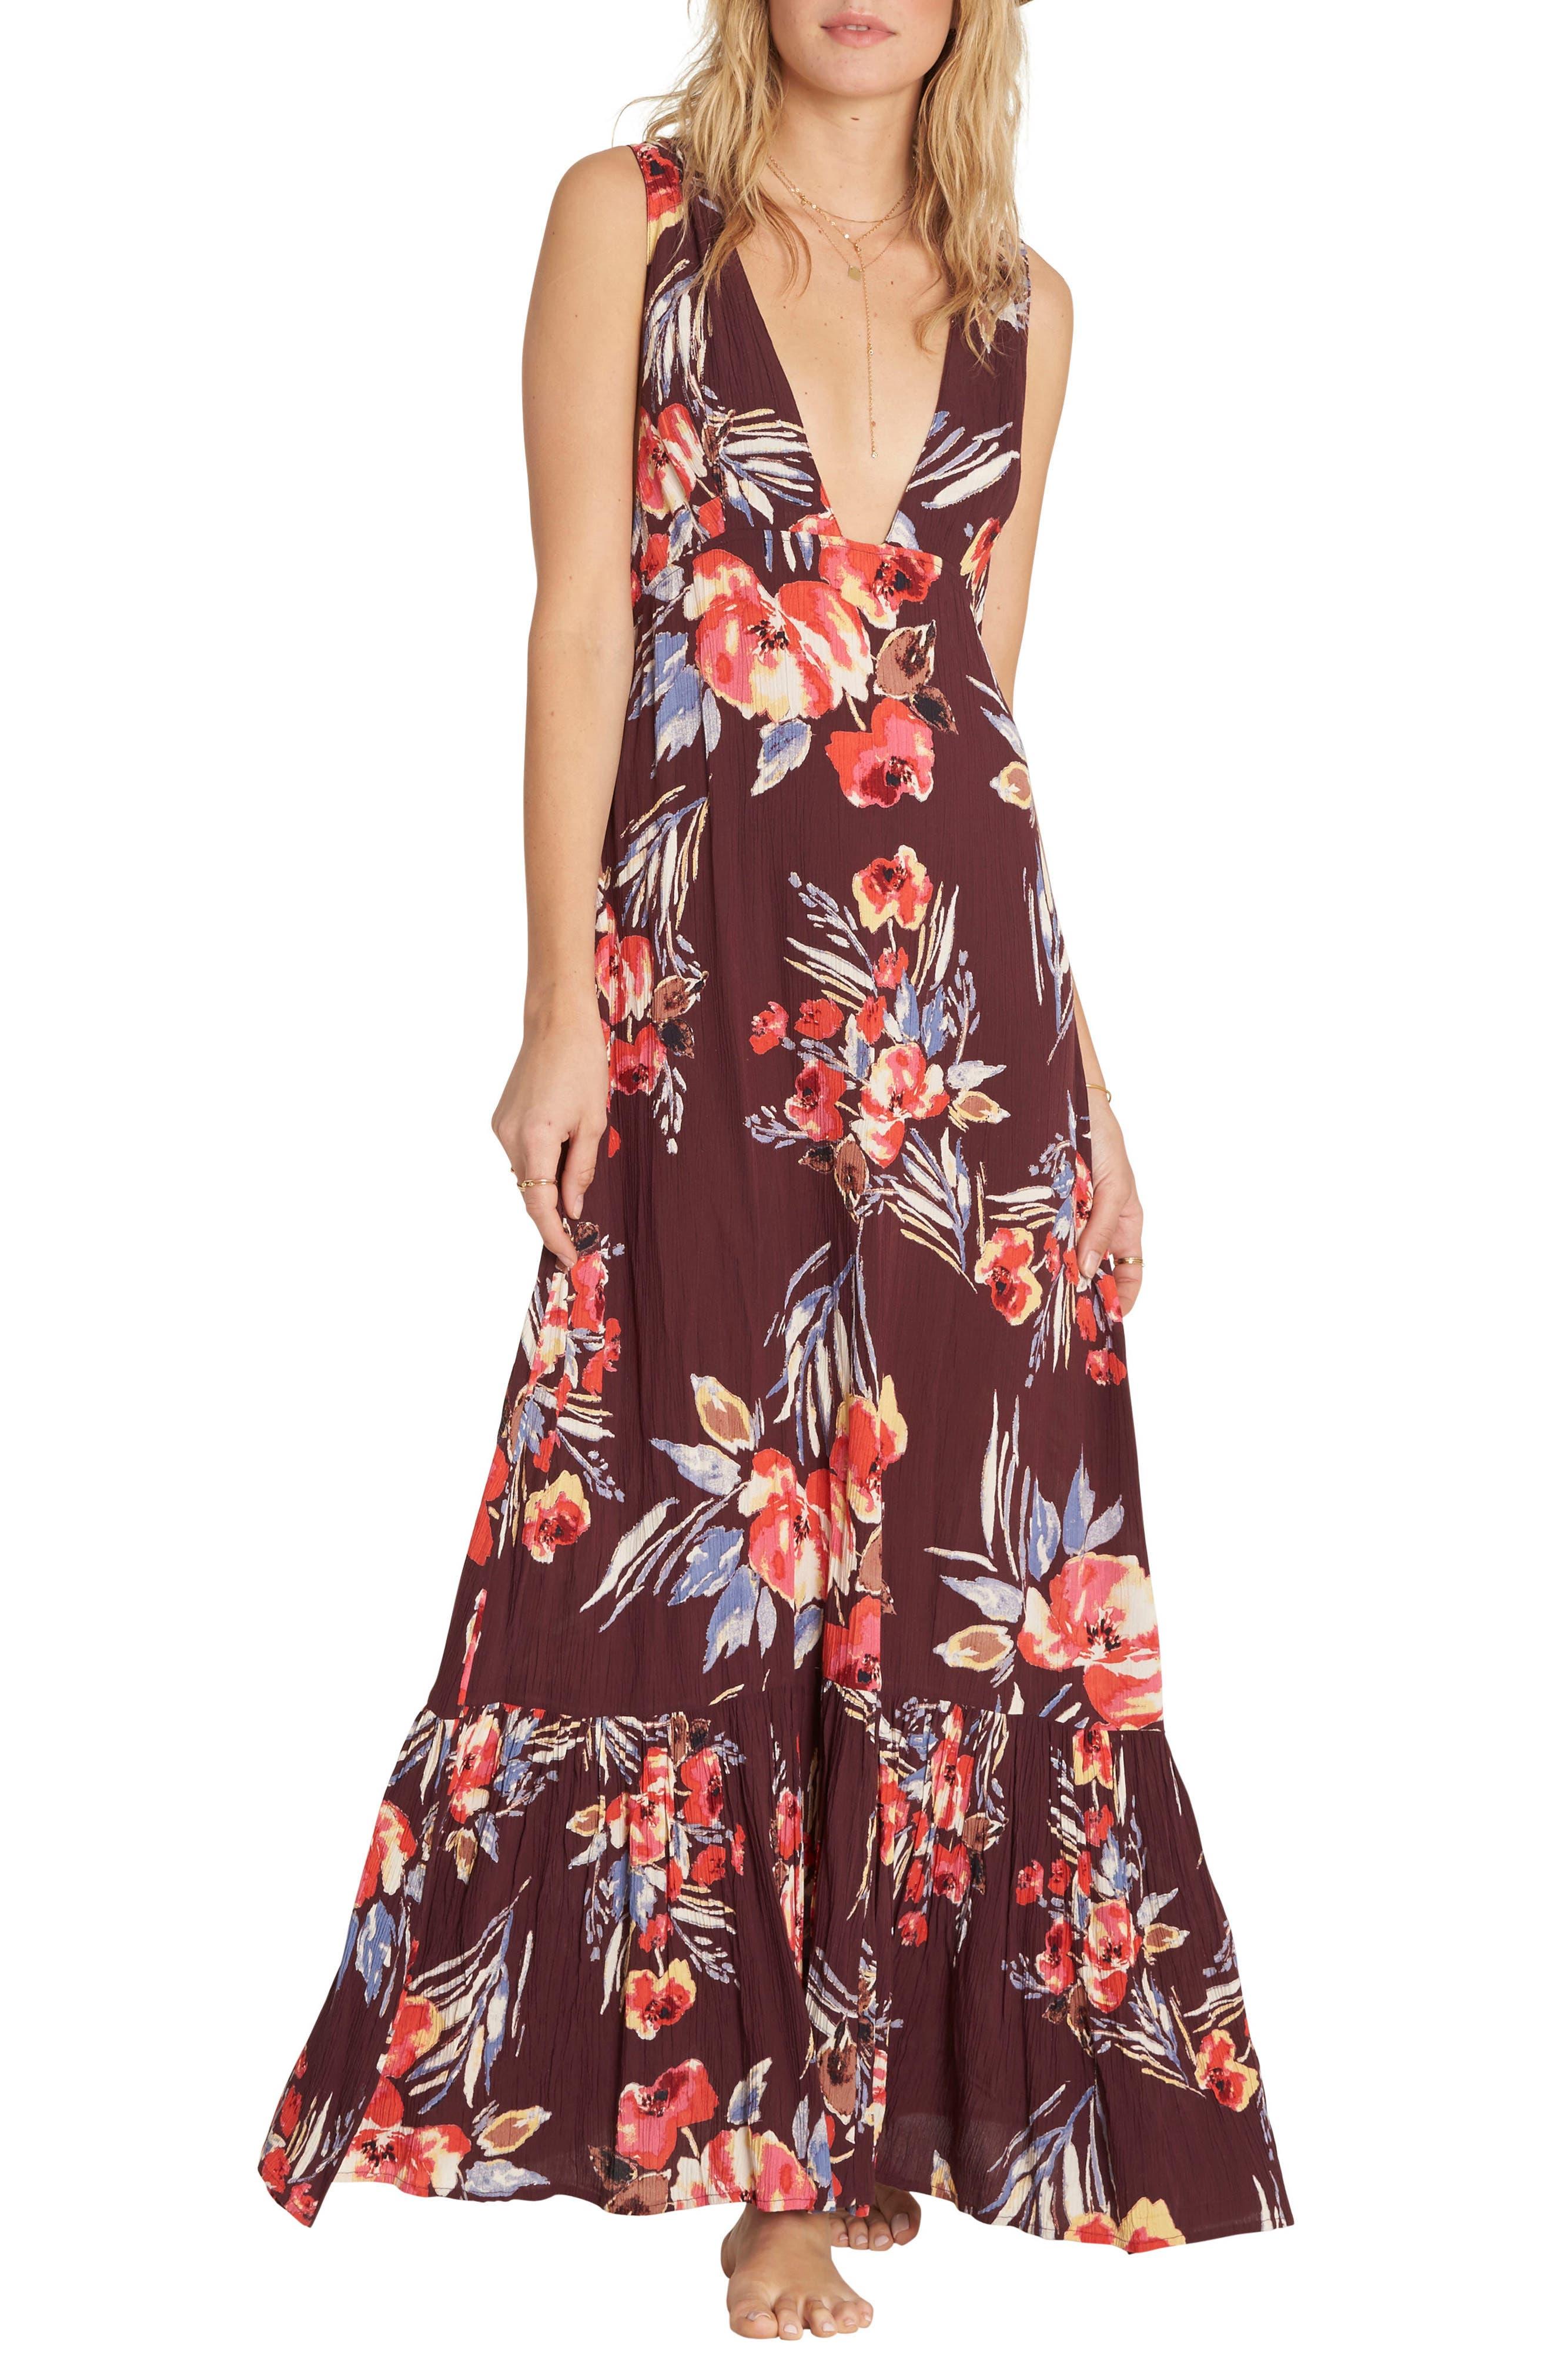 Alternate Image 1 Selected - Billabong Awoke for Waves Floral Print Maxi Dress